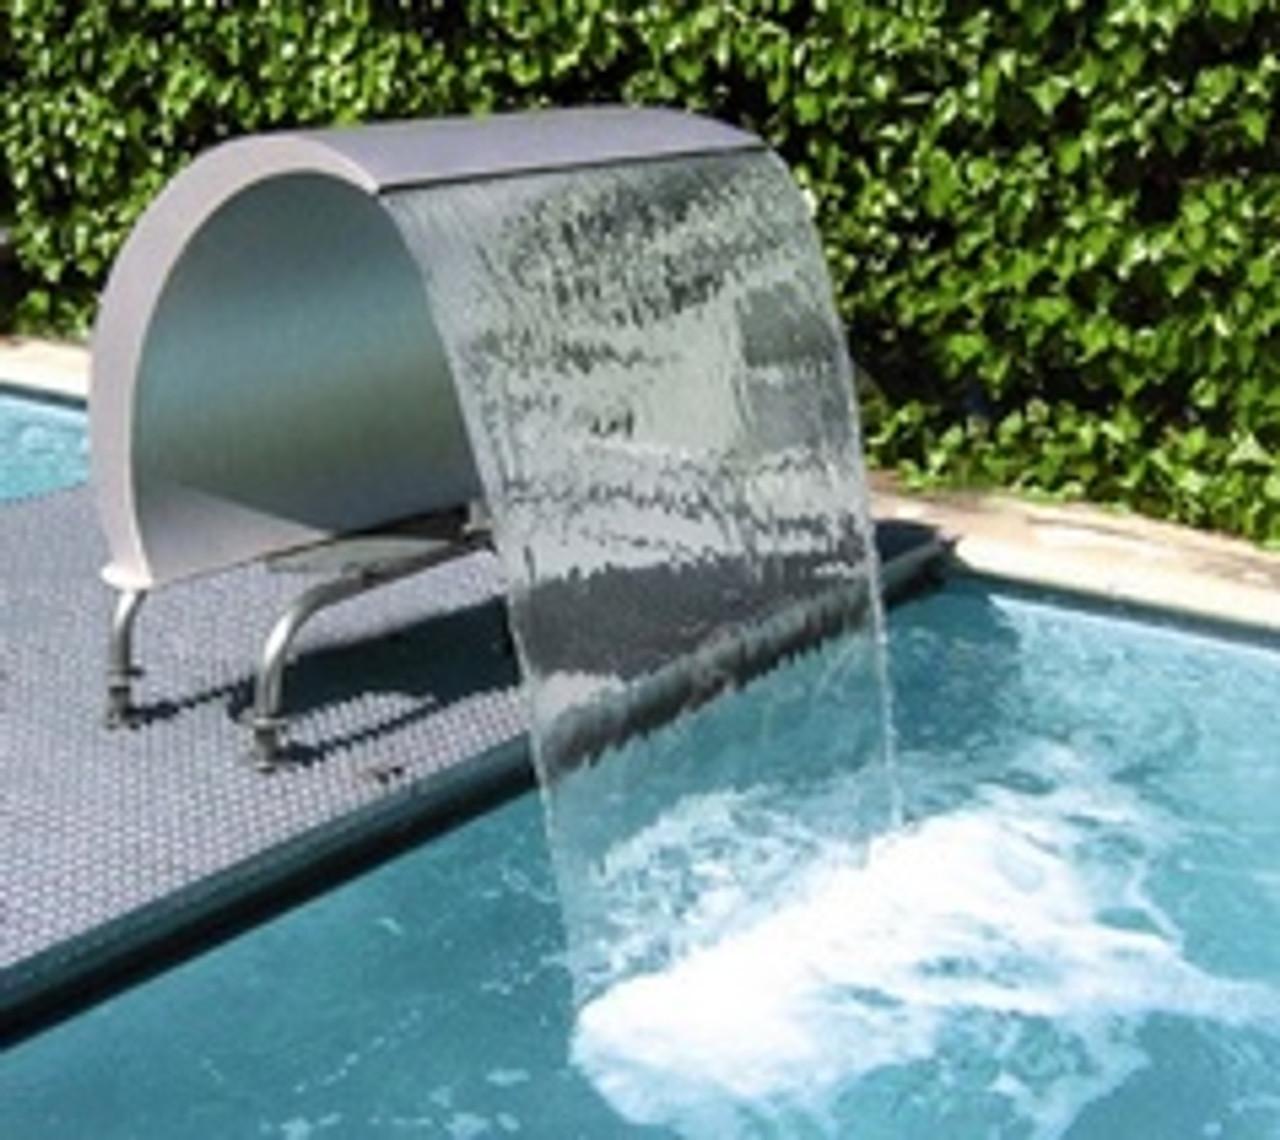 Ornamental Swan Curtain 1000 Swimming Pool Water Fountain (34390)